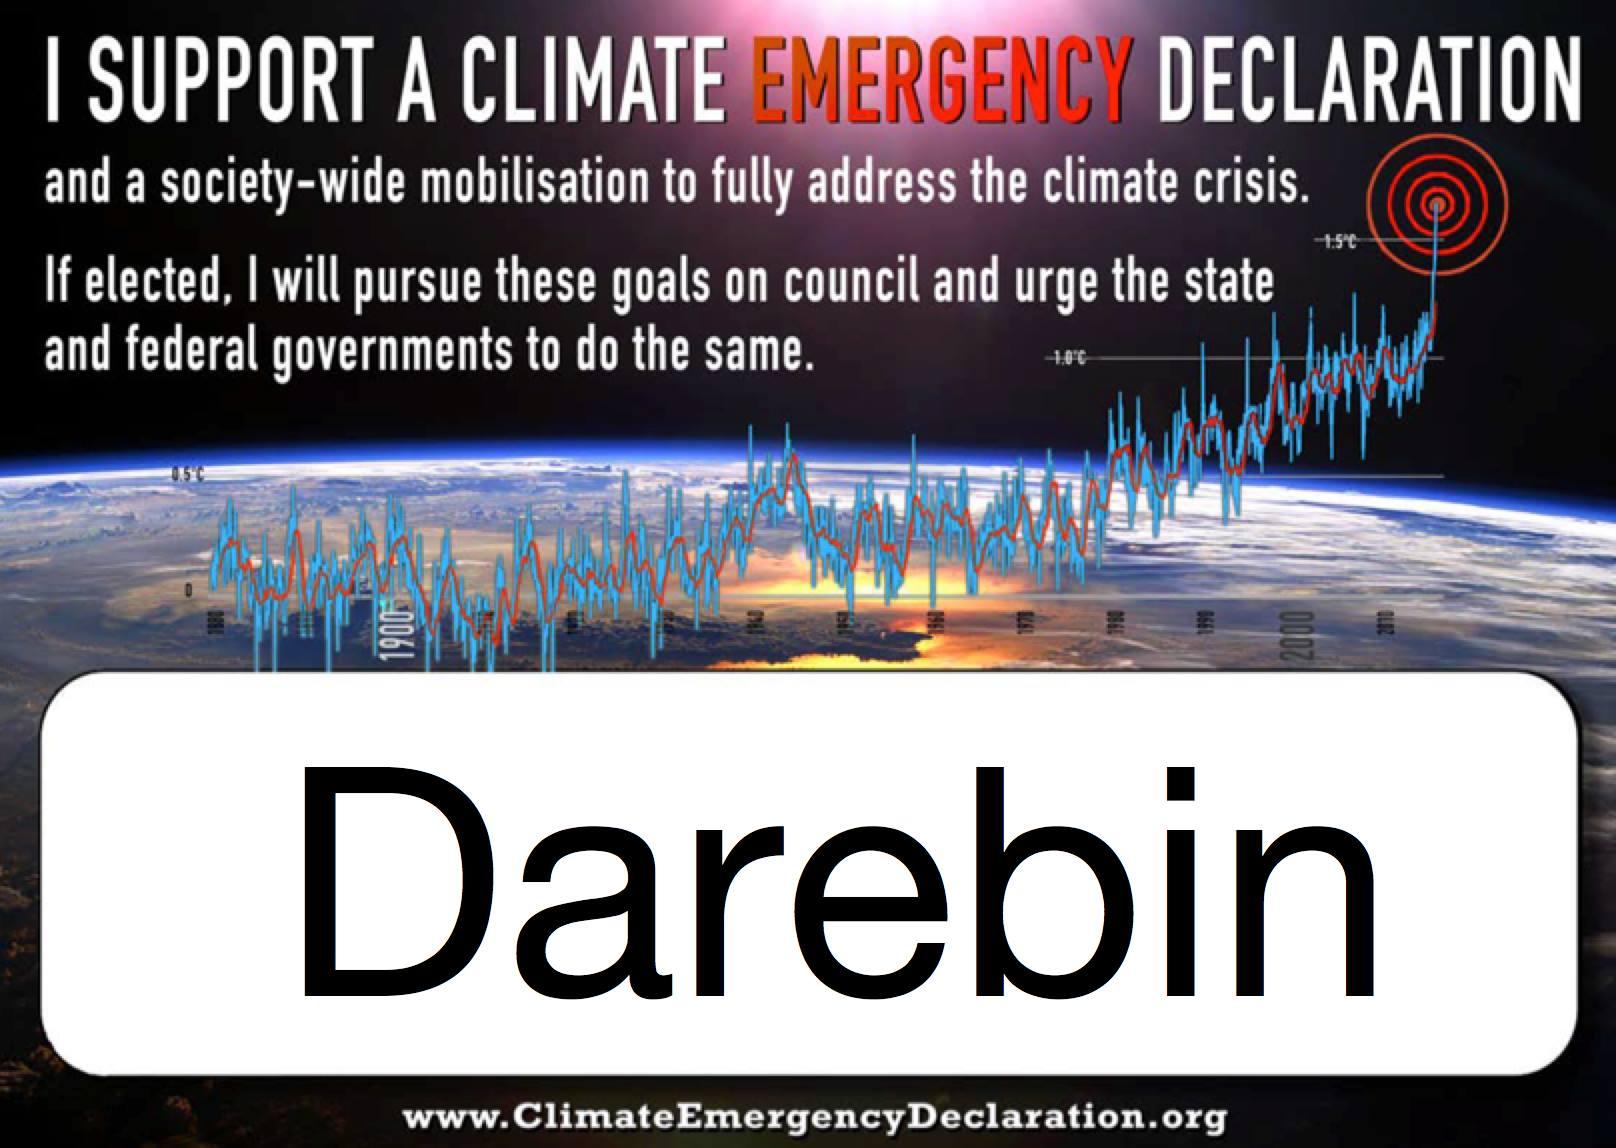 Climate_Emergency_Darebin.jpg